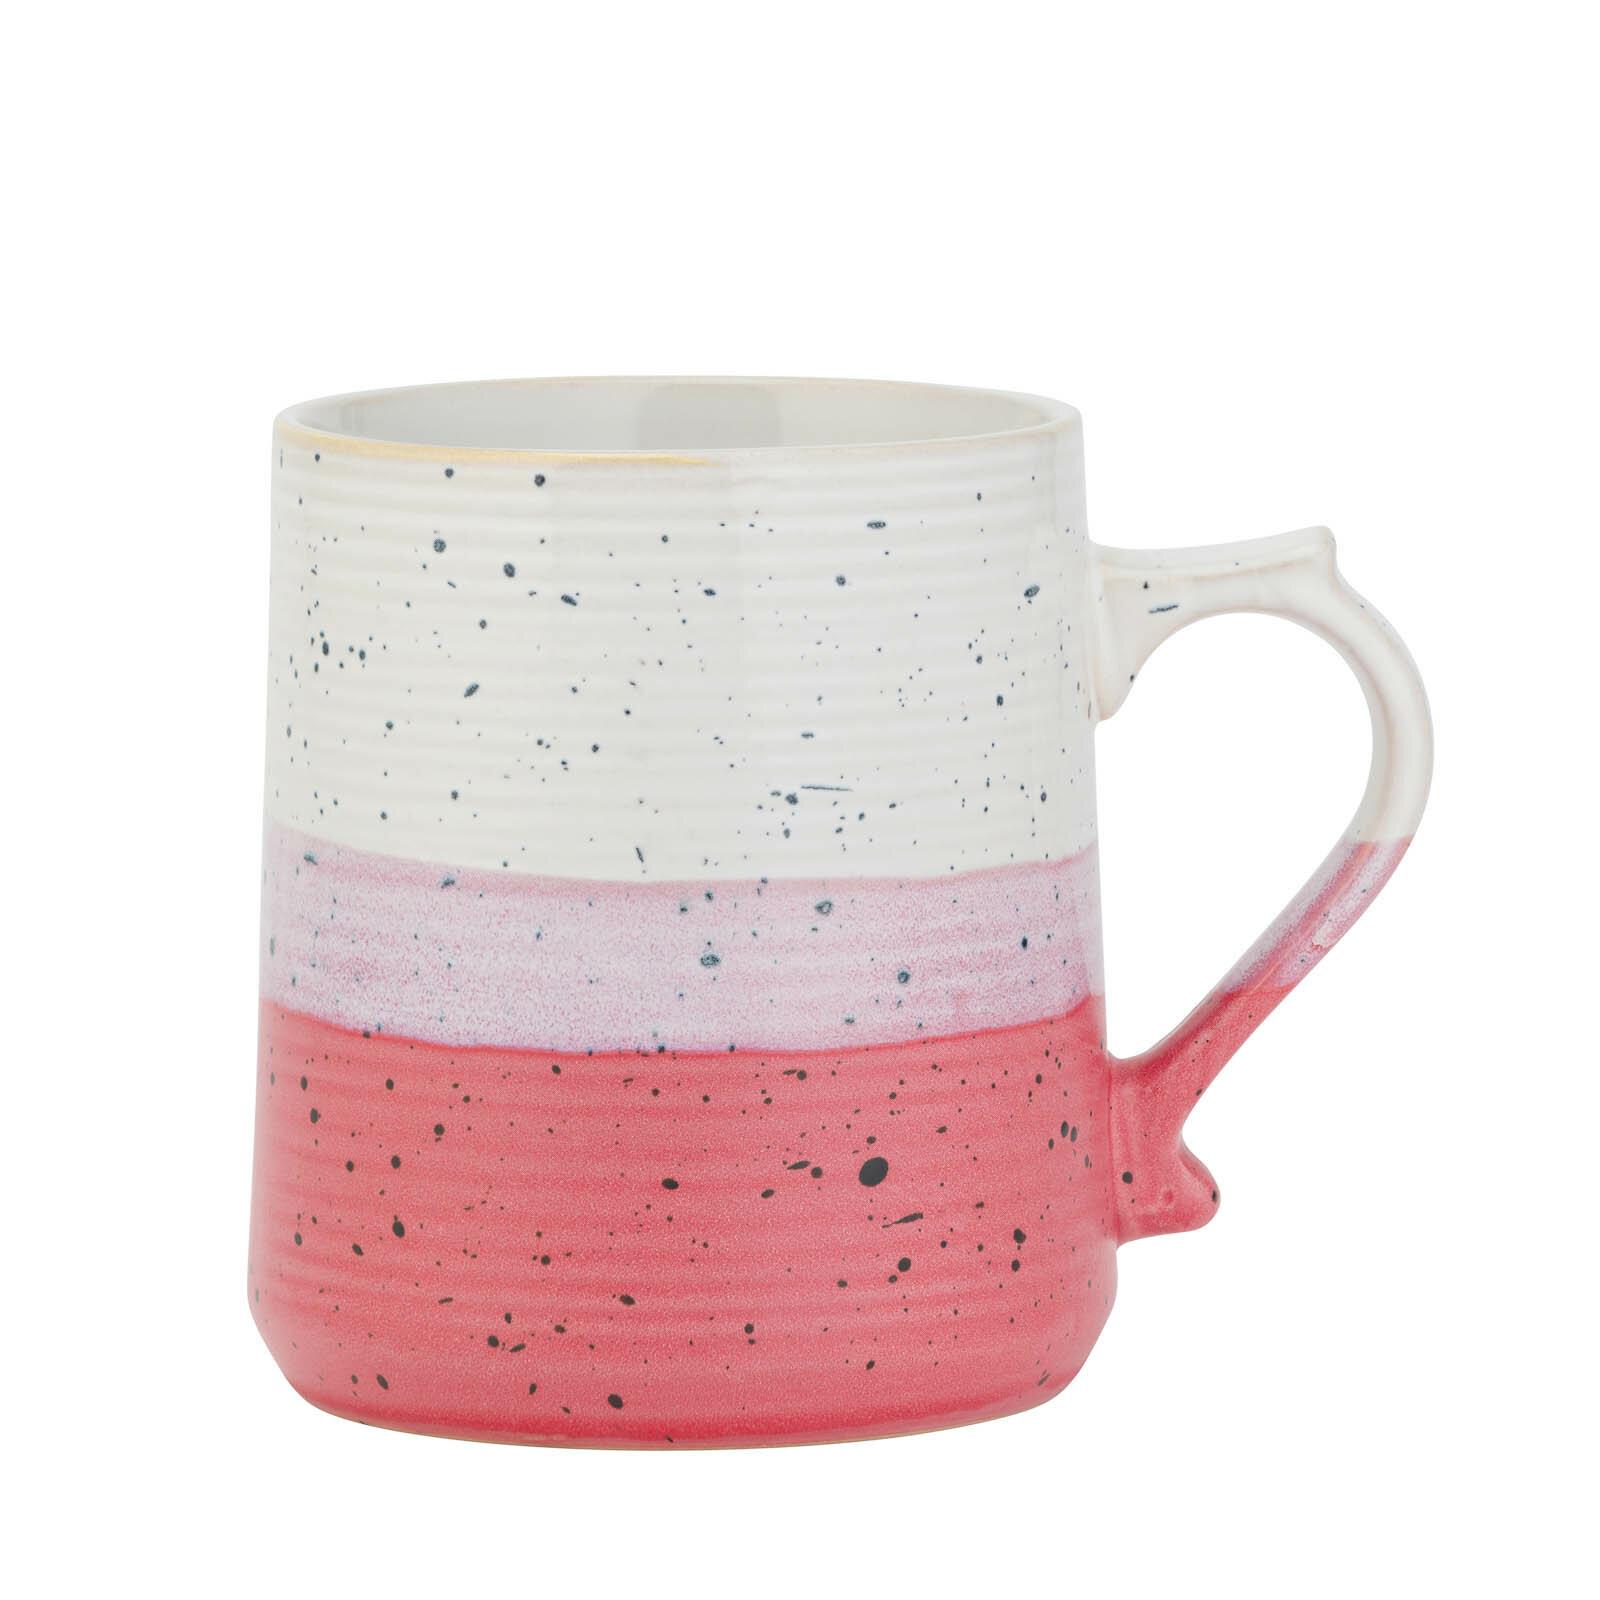 Ebern Designs Humphery Reactive Glaze Coffee Mug Reviews Wayfair